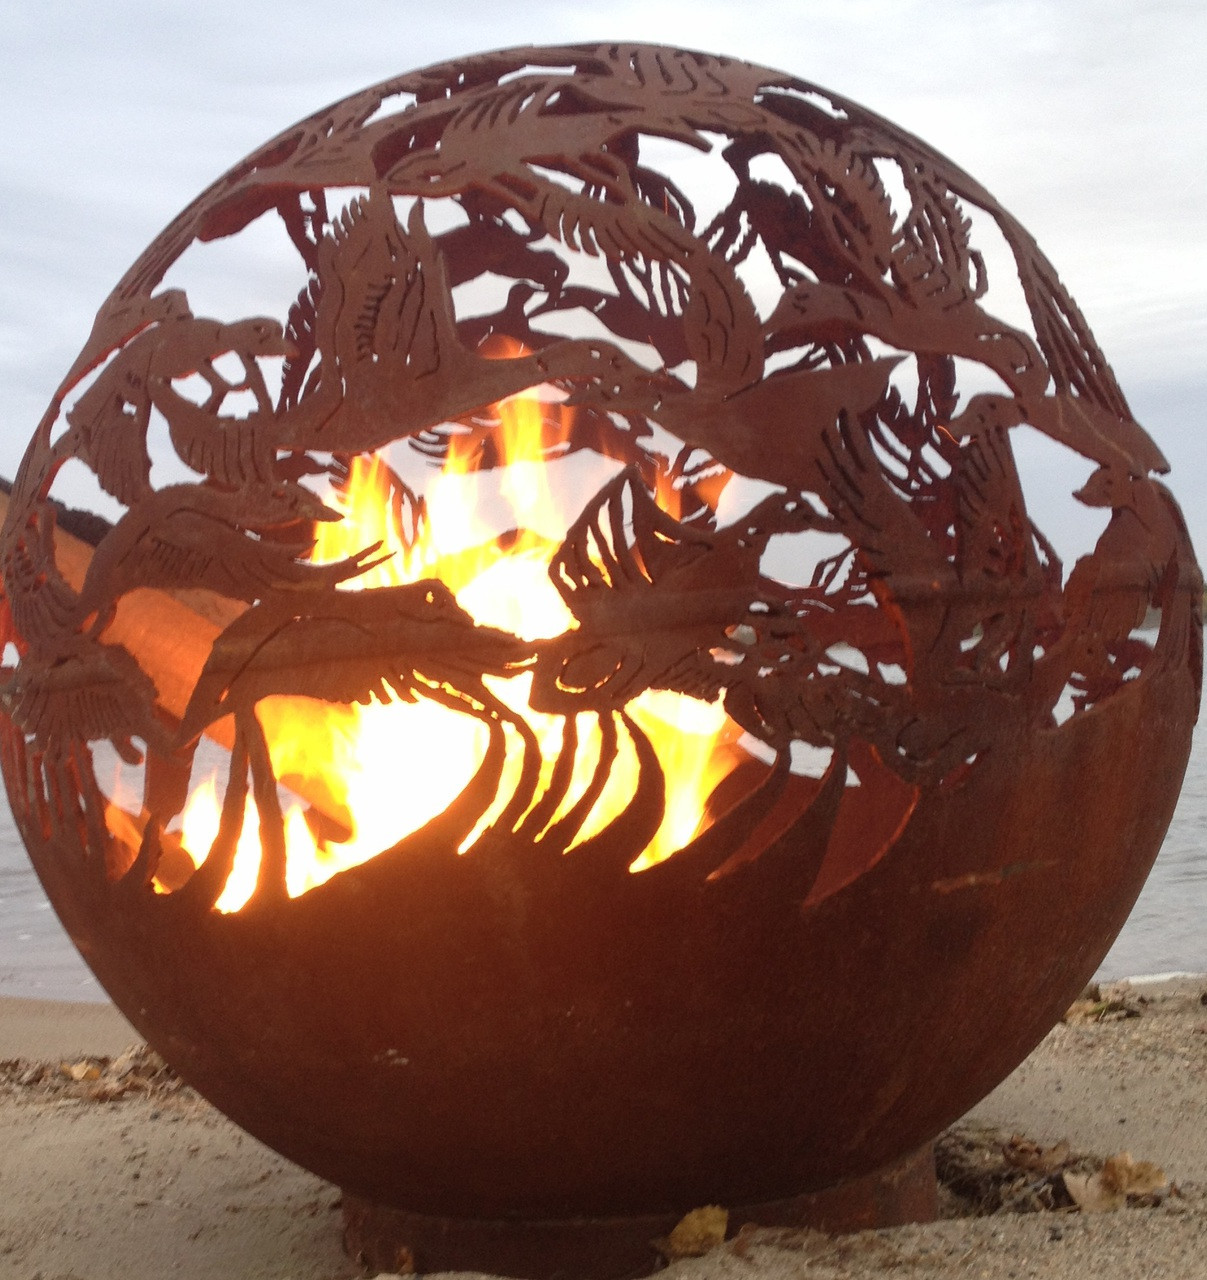 Fireball Fire Pits - Ducks - 37.5 inch Fire Globe - Fireball Fire Pits - Ducks - 37.5 Inch Fire Globe - 3715du - The